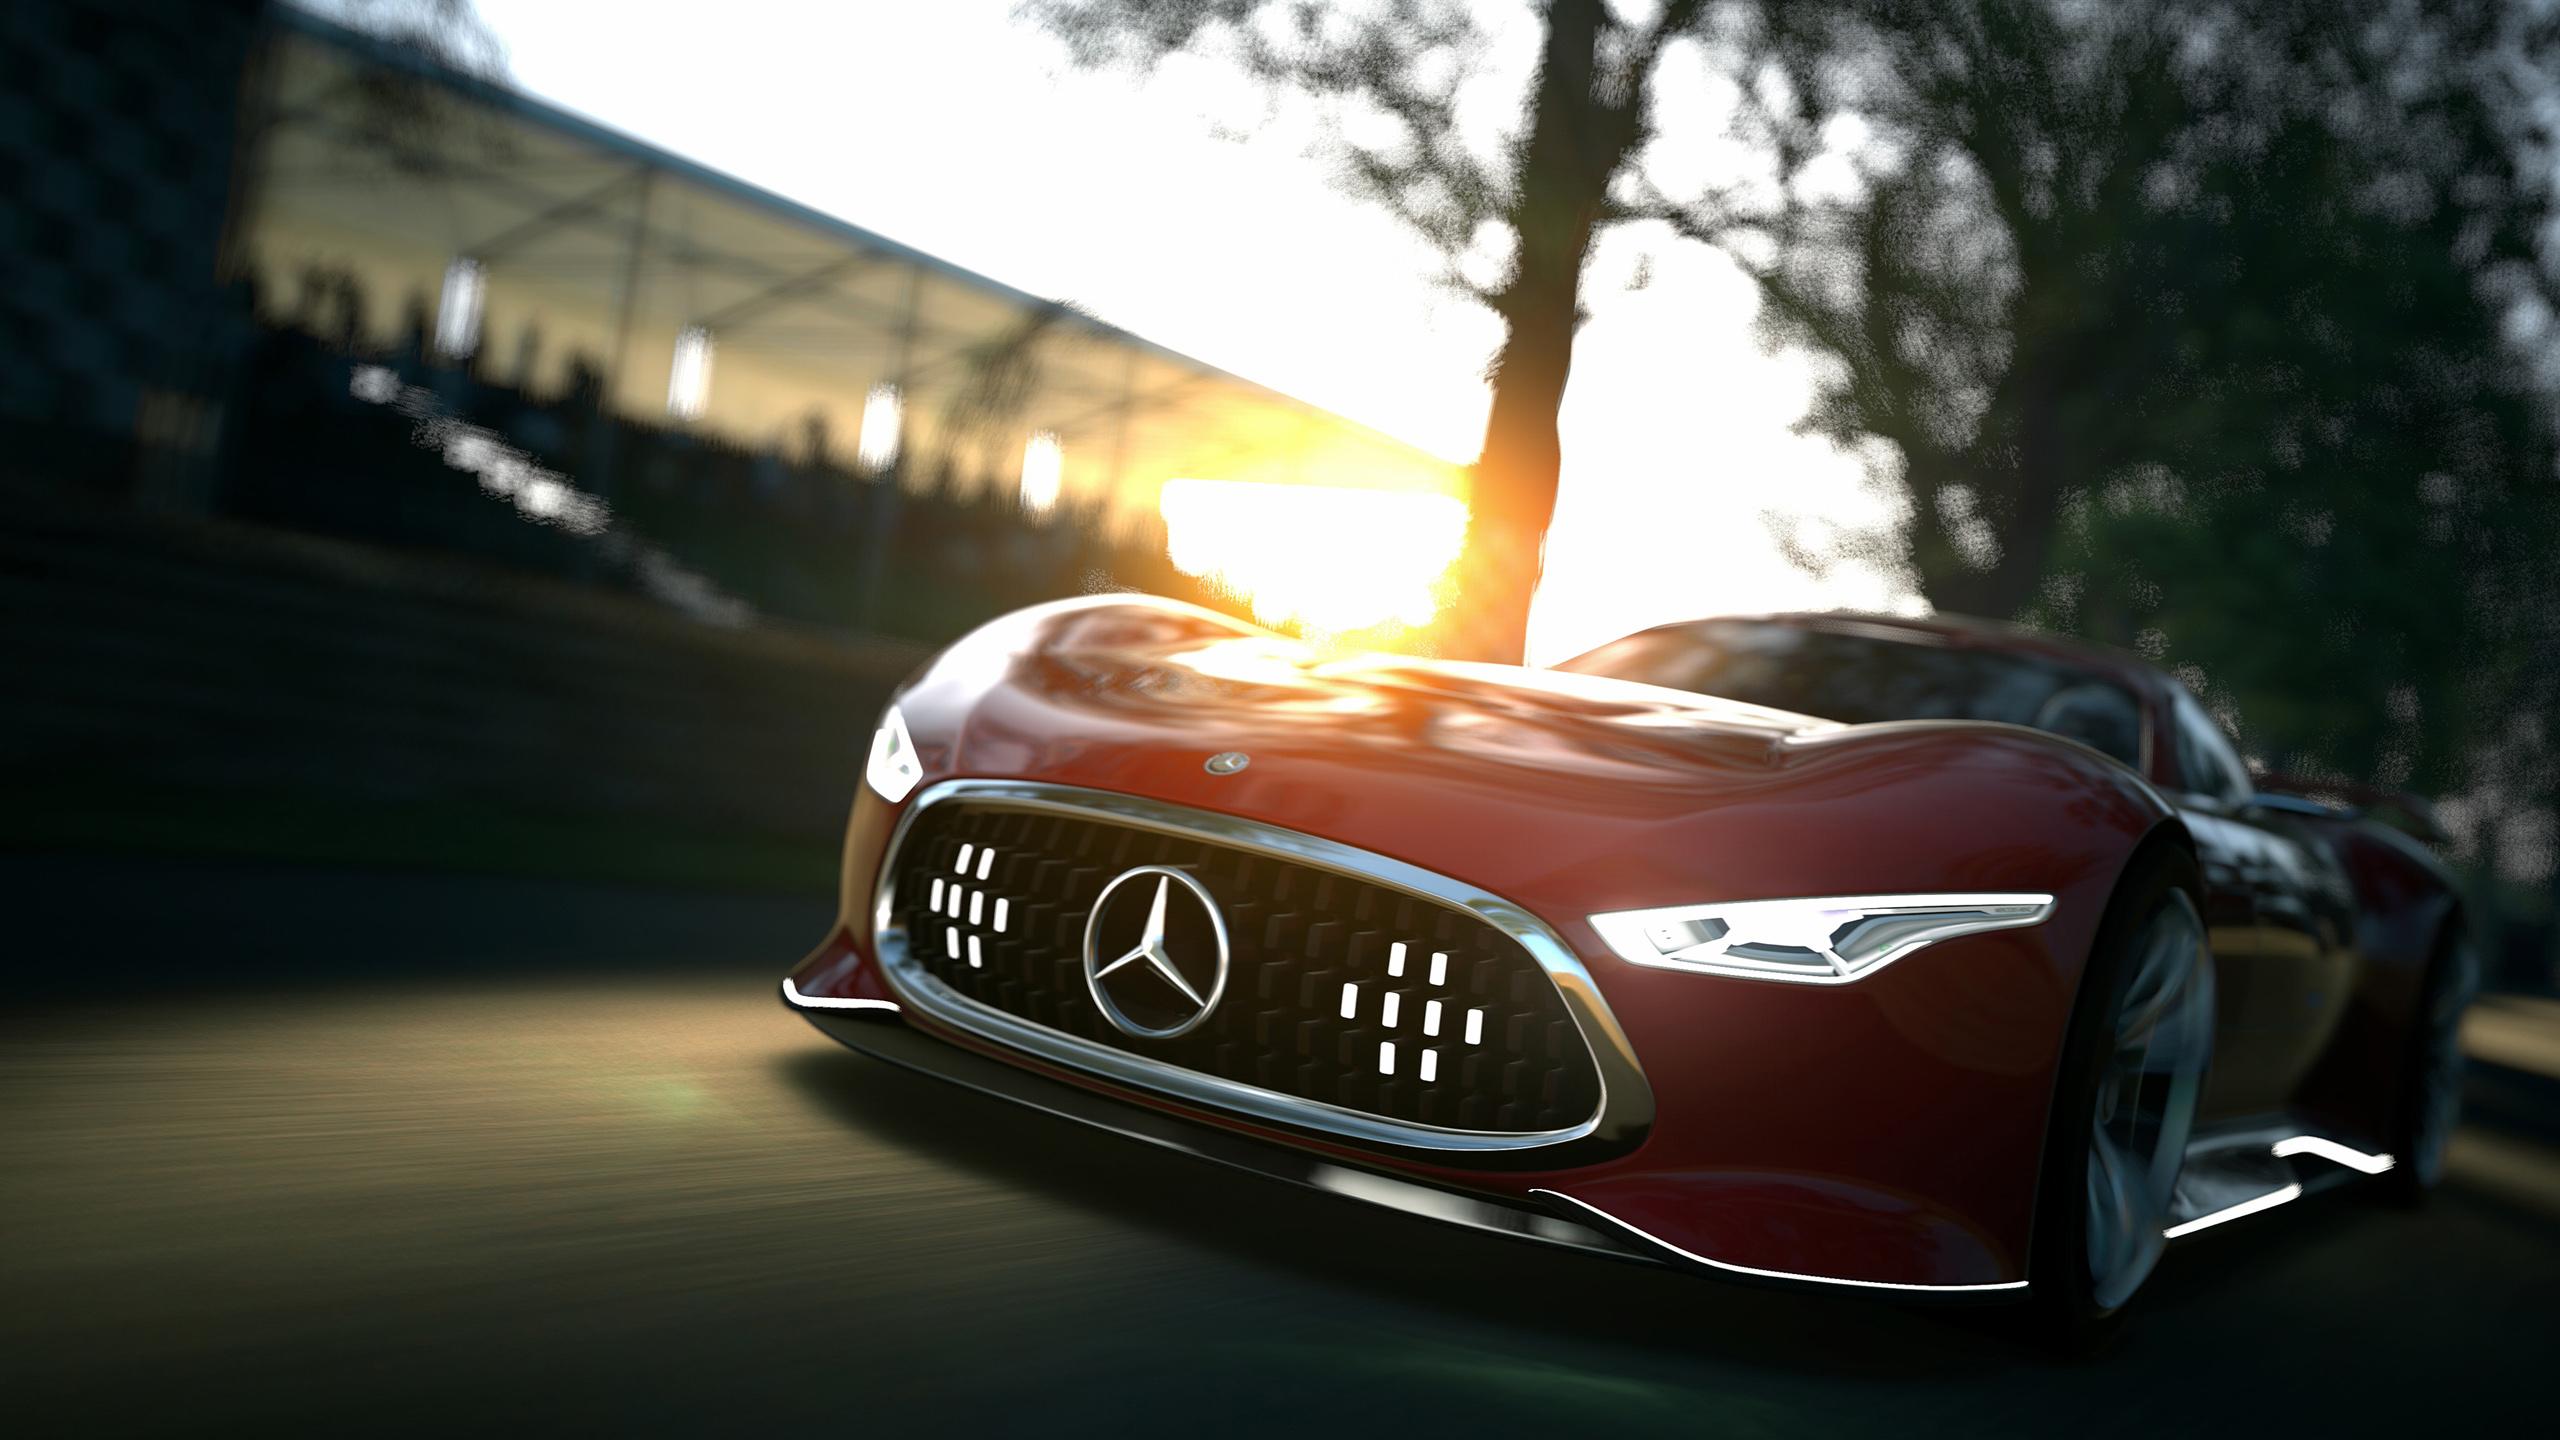 Mercedes Benz AMG Vision Gran Turismo Concept Wallpaper 2560x1440